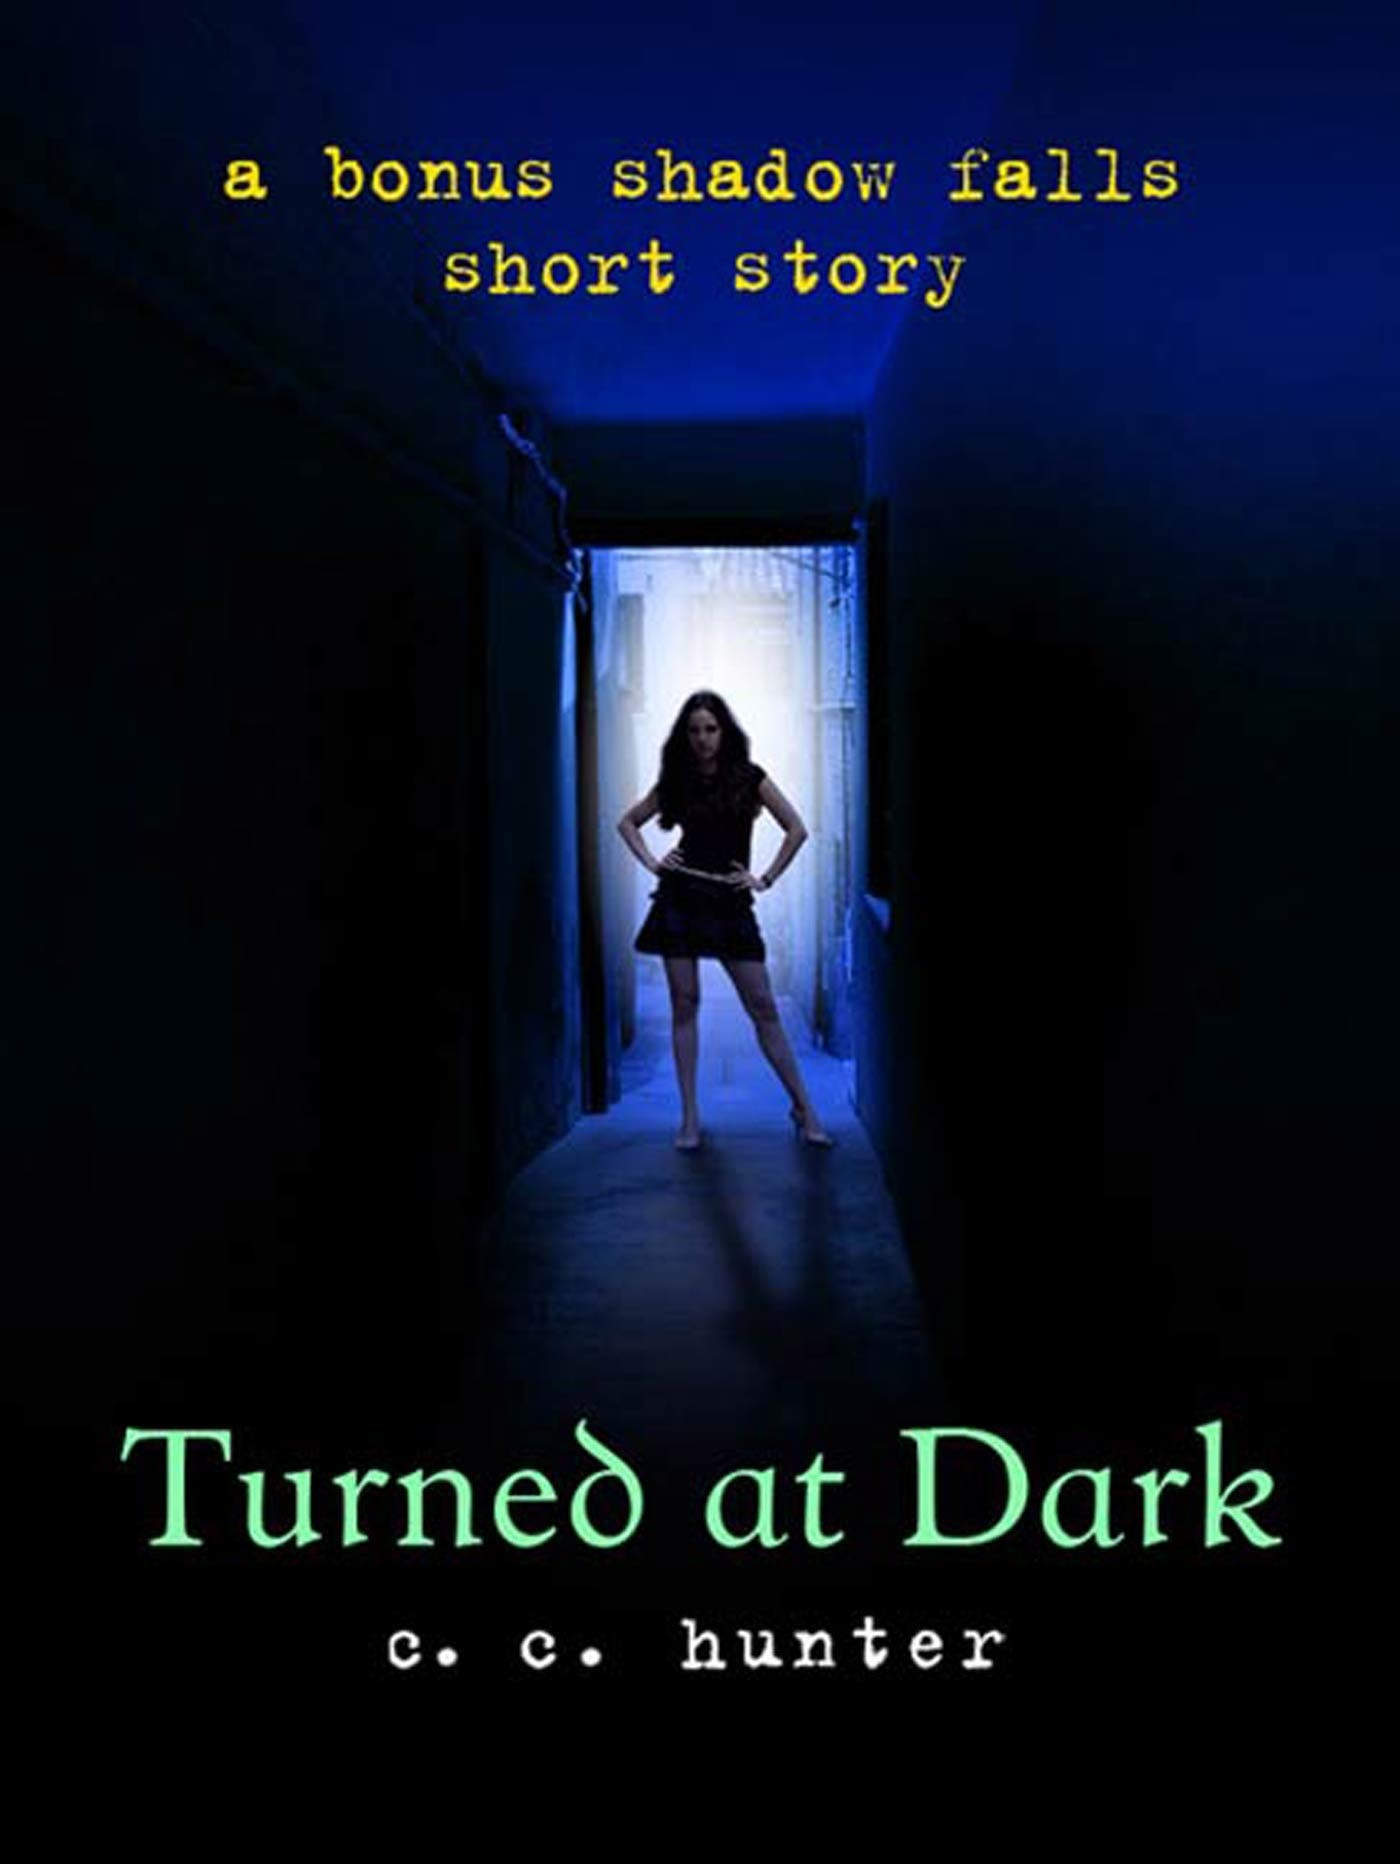 Image of Turned at Dark